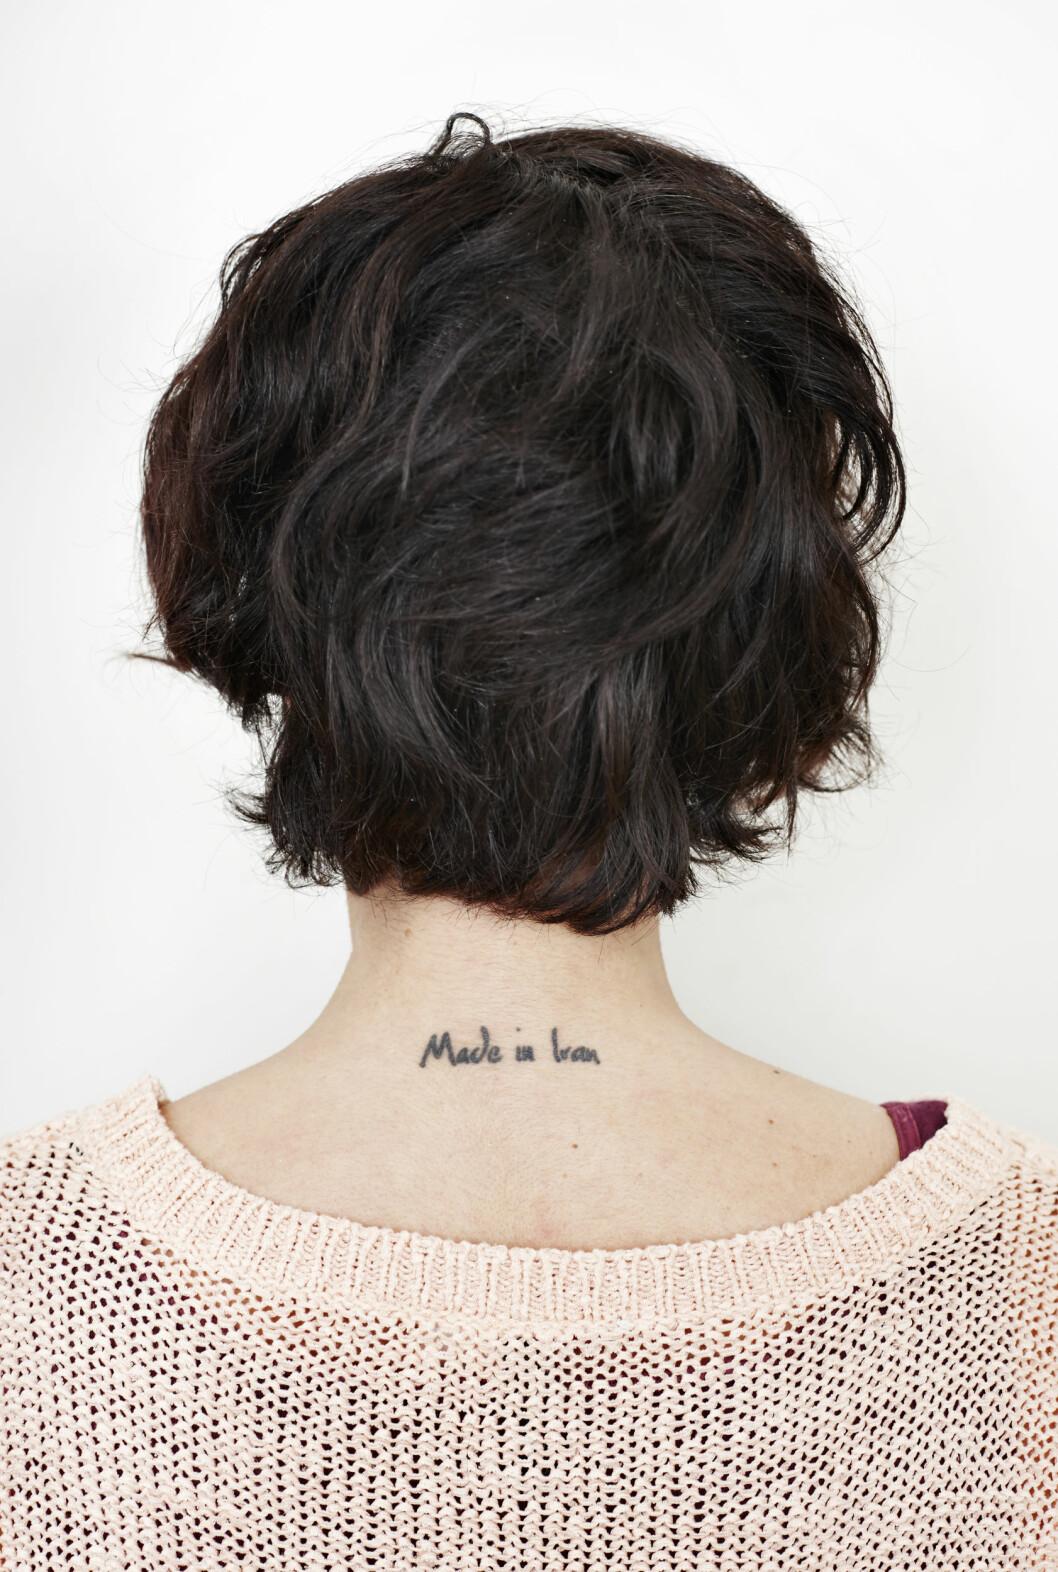 <strong>TATOVERING I NAKKEN:</strong> Lisa Tønnes tatovering levner ingen tvil om hvor hun ble født.  Foto: Geir Dokken